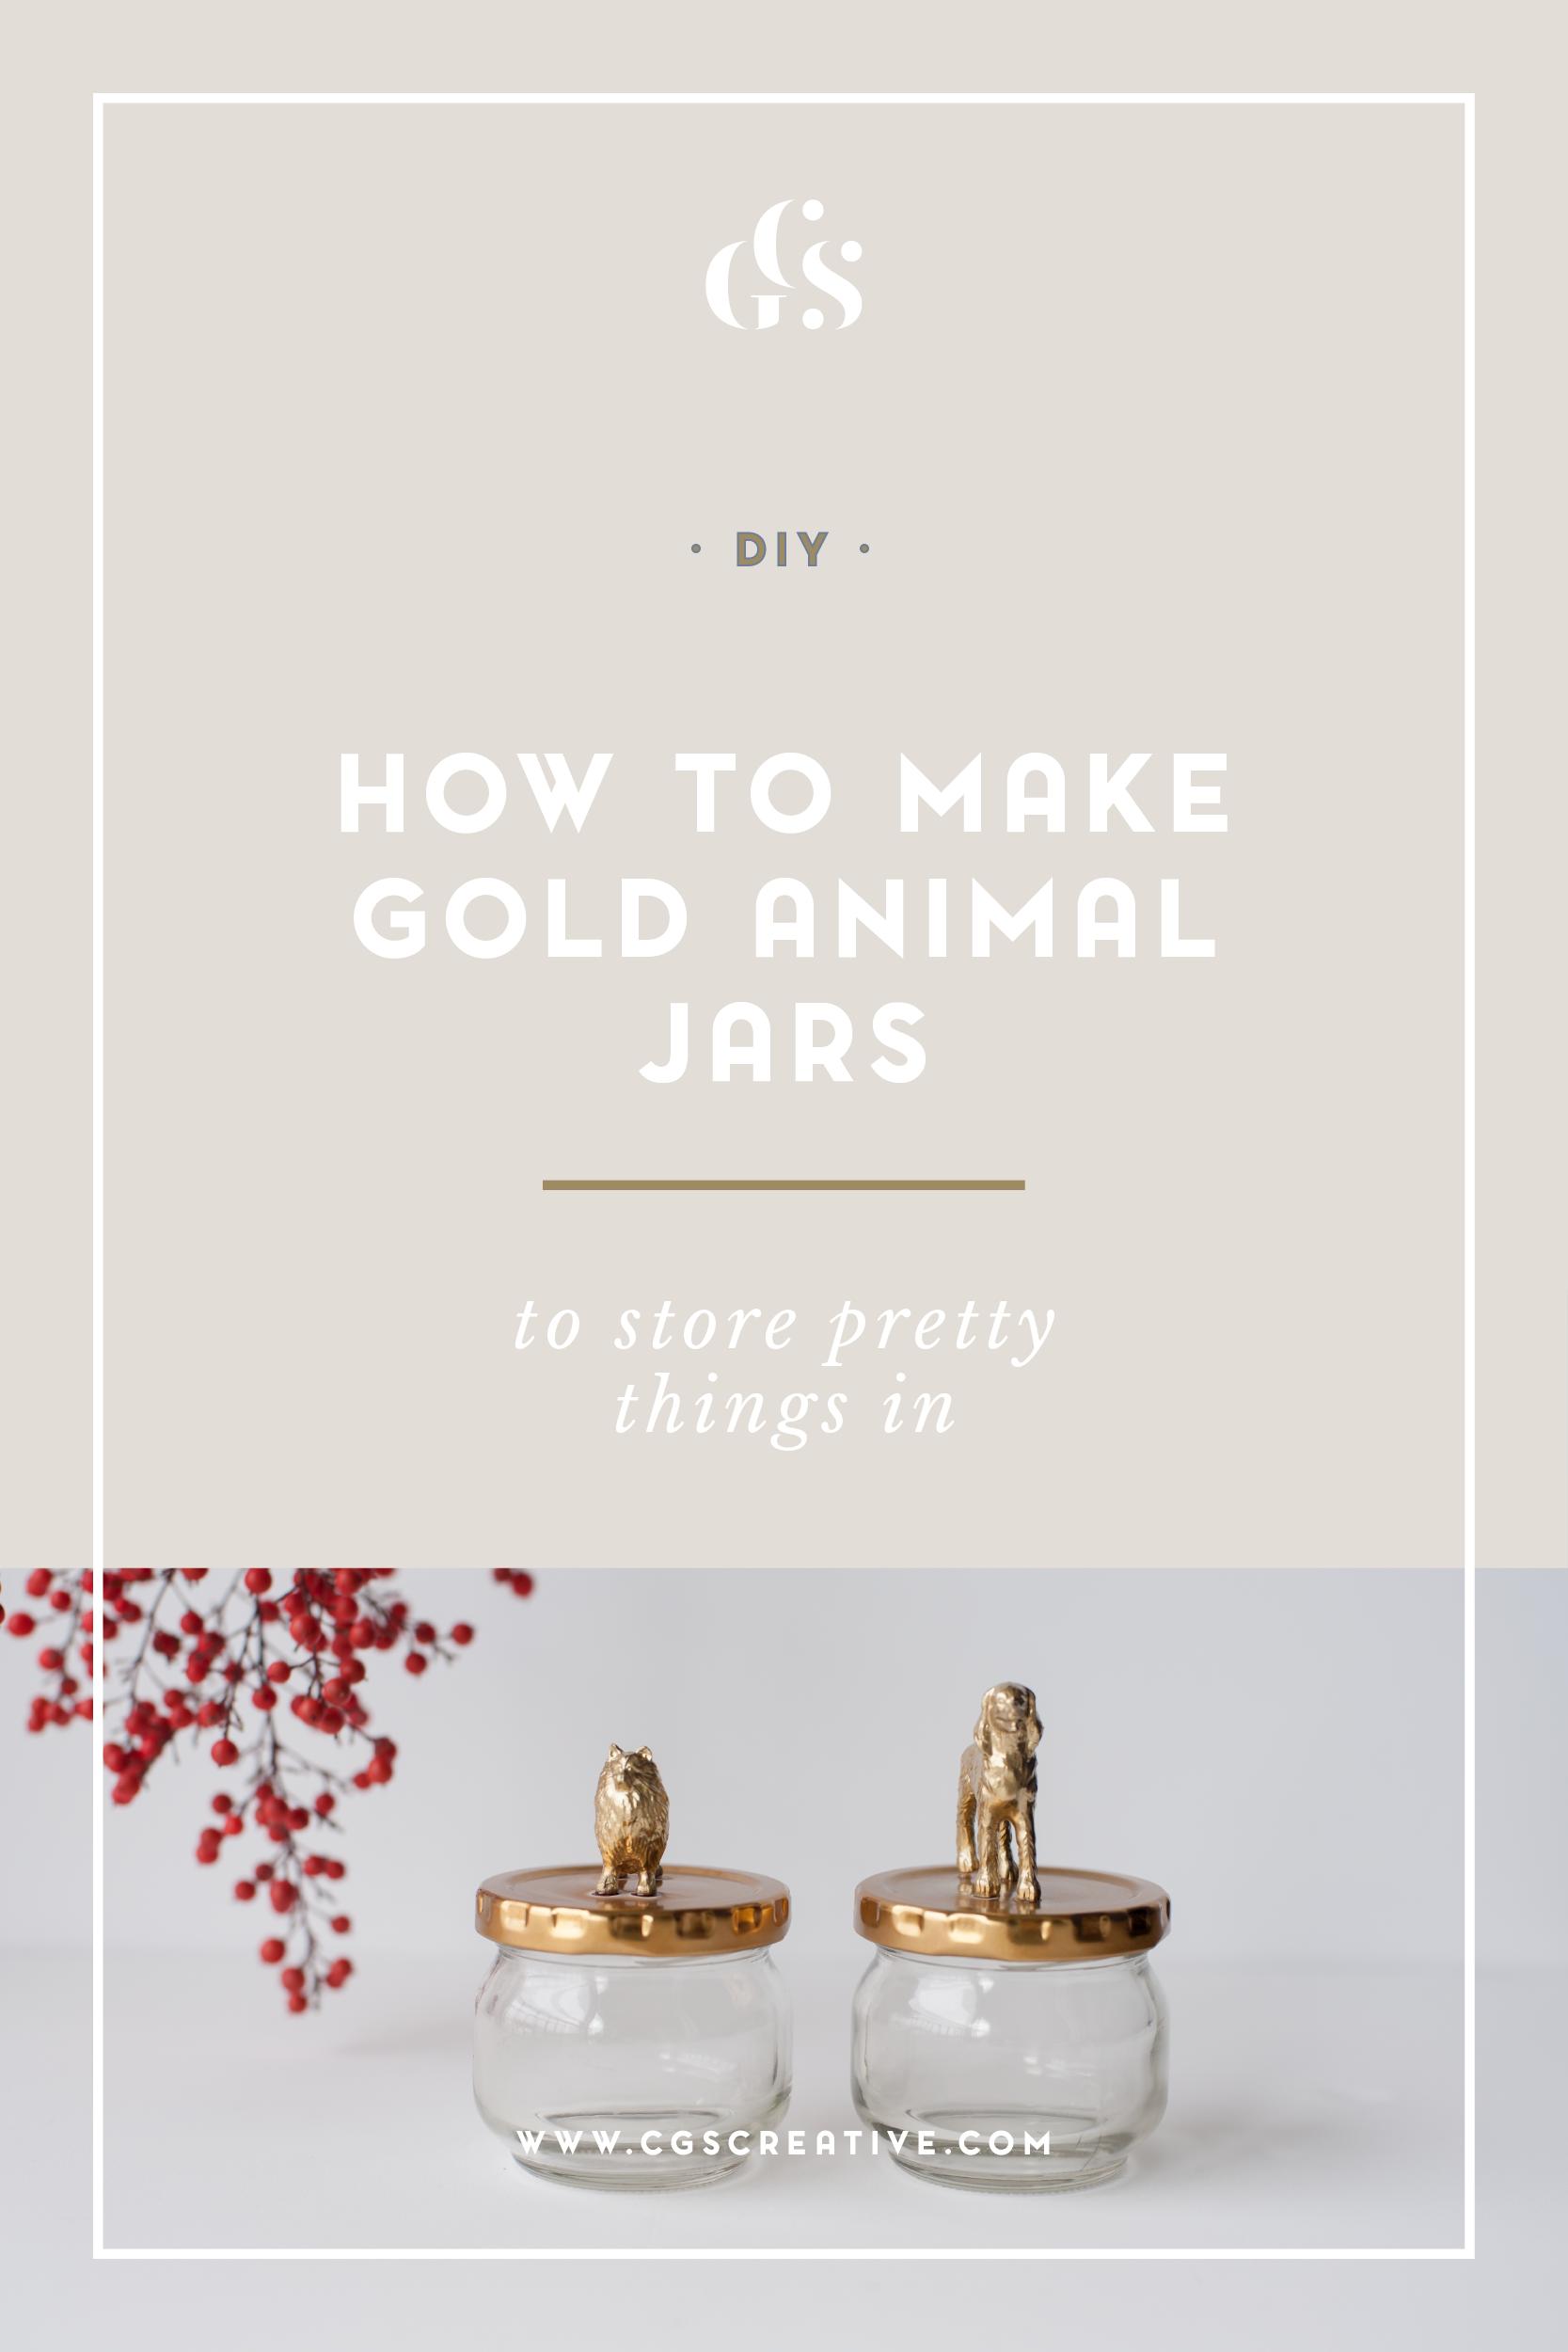 How To Make Gold Animal Glass Jars